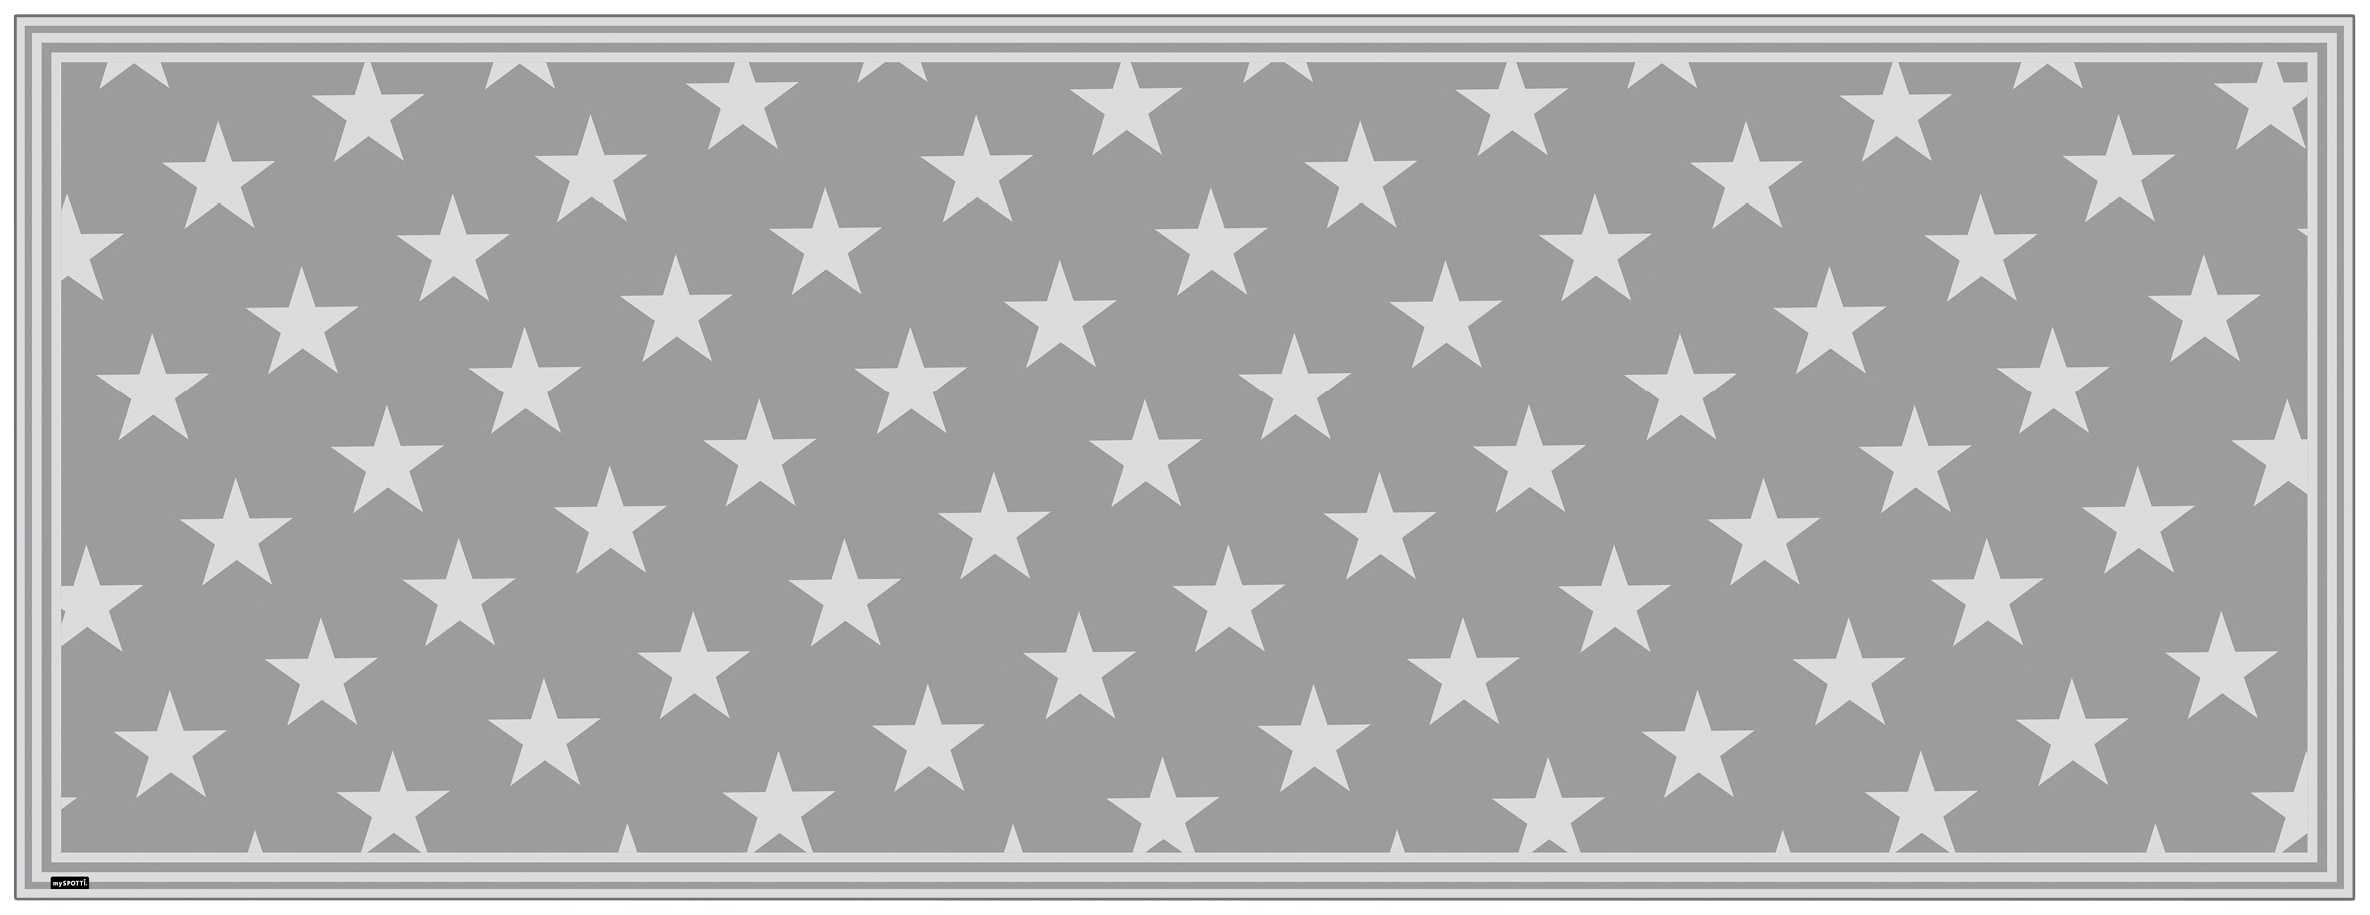 MYSPOTTI Packung: Vinylteppich Buddy Mini Star Grey, statisch haftend | Garten > Bodenbeläge-Garten | Myspotti